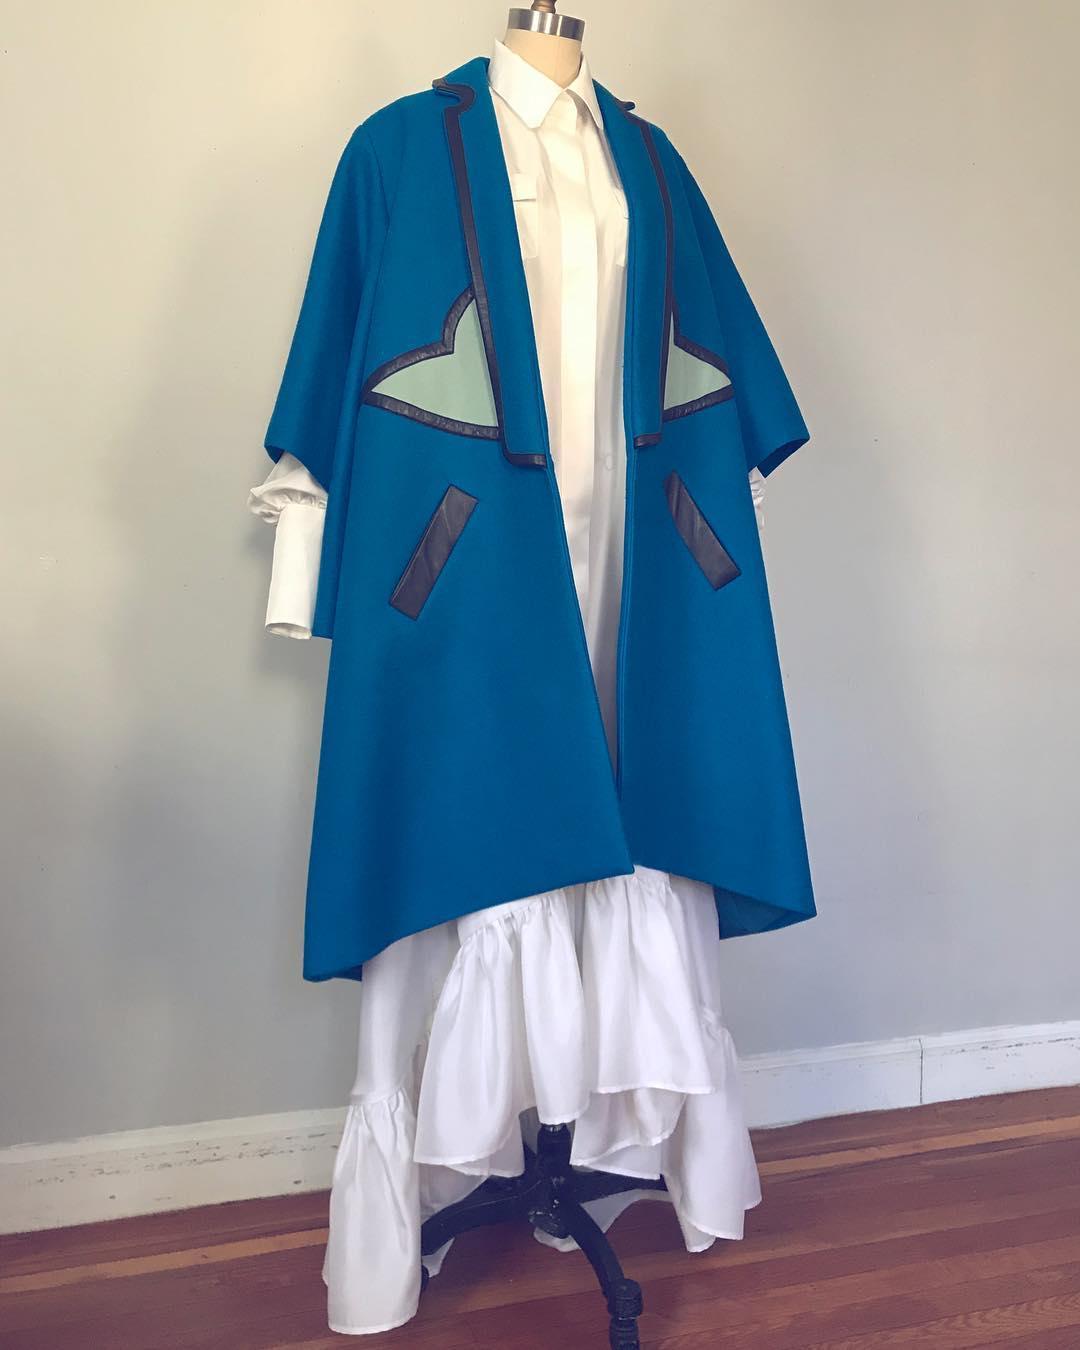 Namibia Viera_blue wool coat.jpg